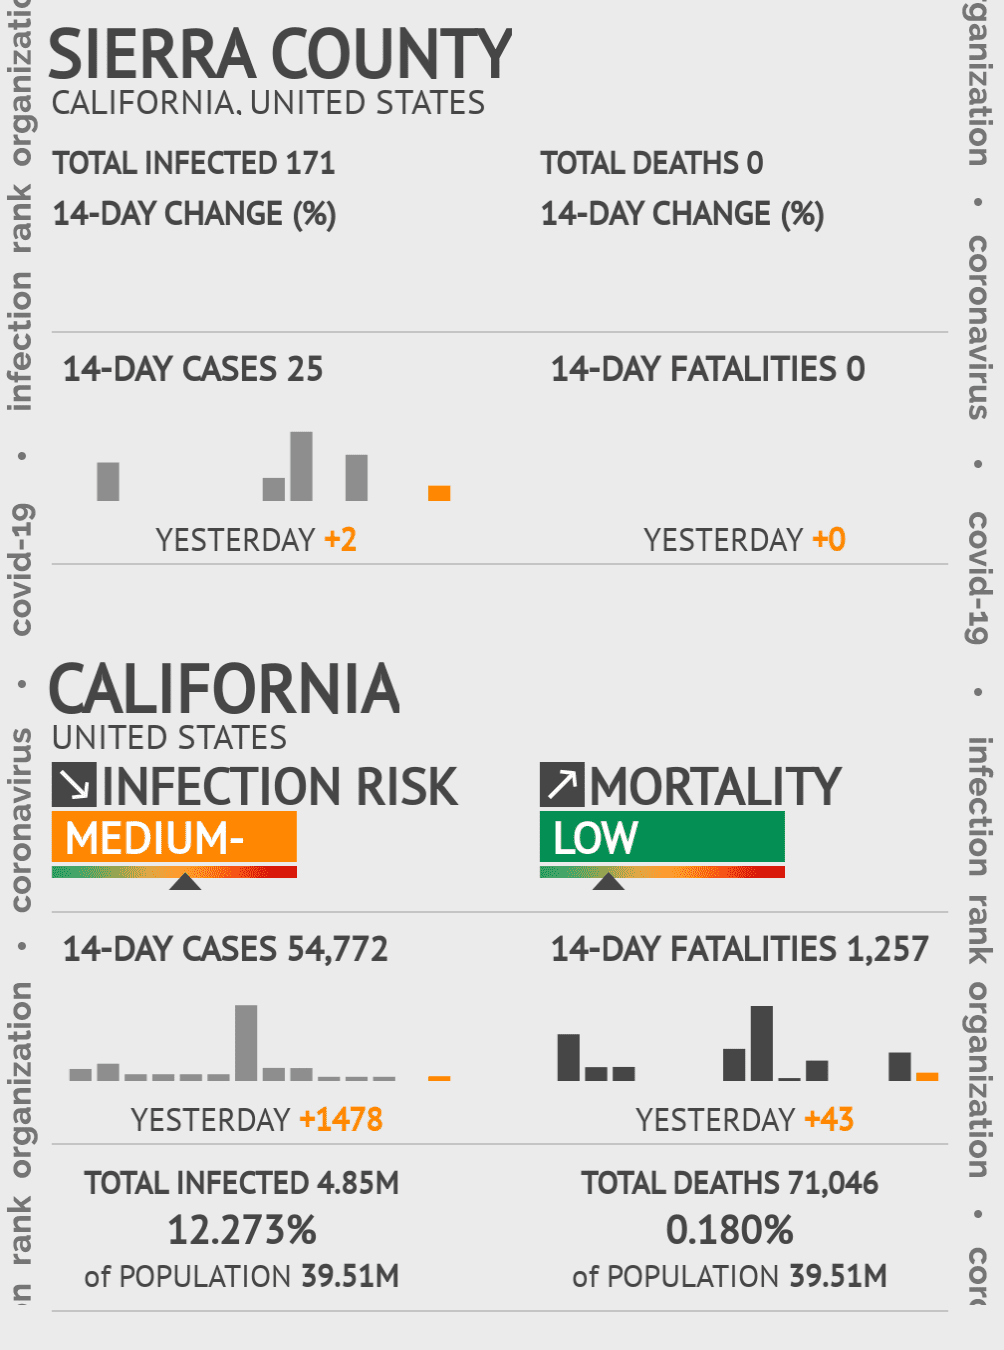 Sierra County Coronavirus Covid-19 Risk of Infection on July 24, 2021